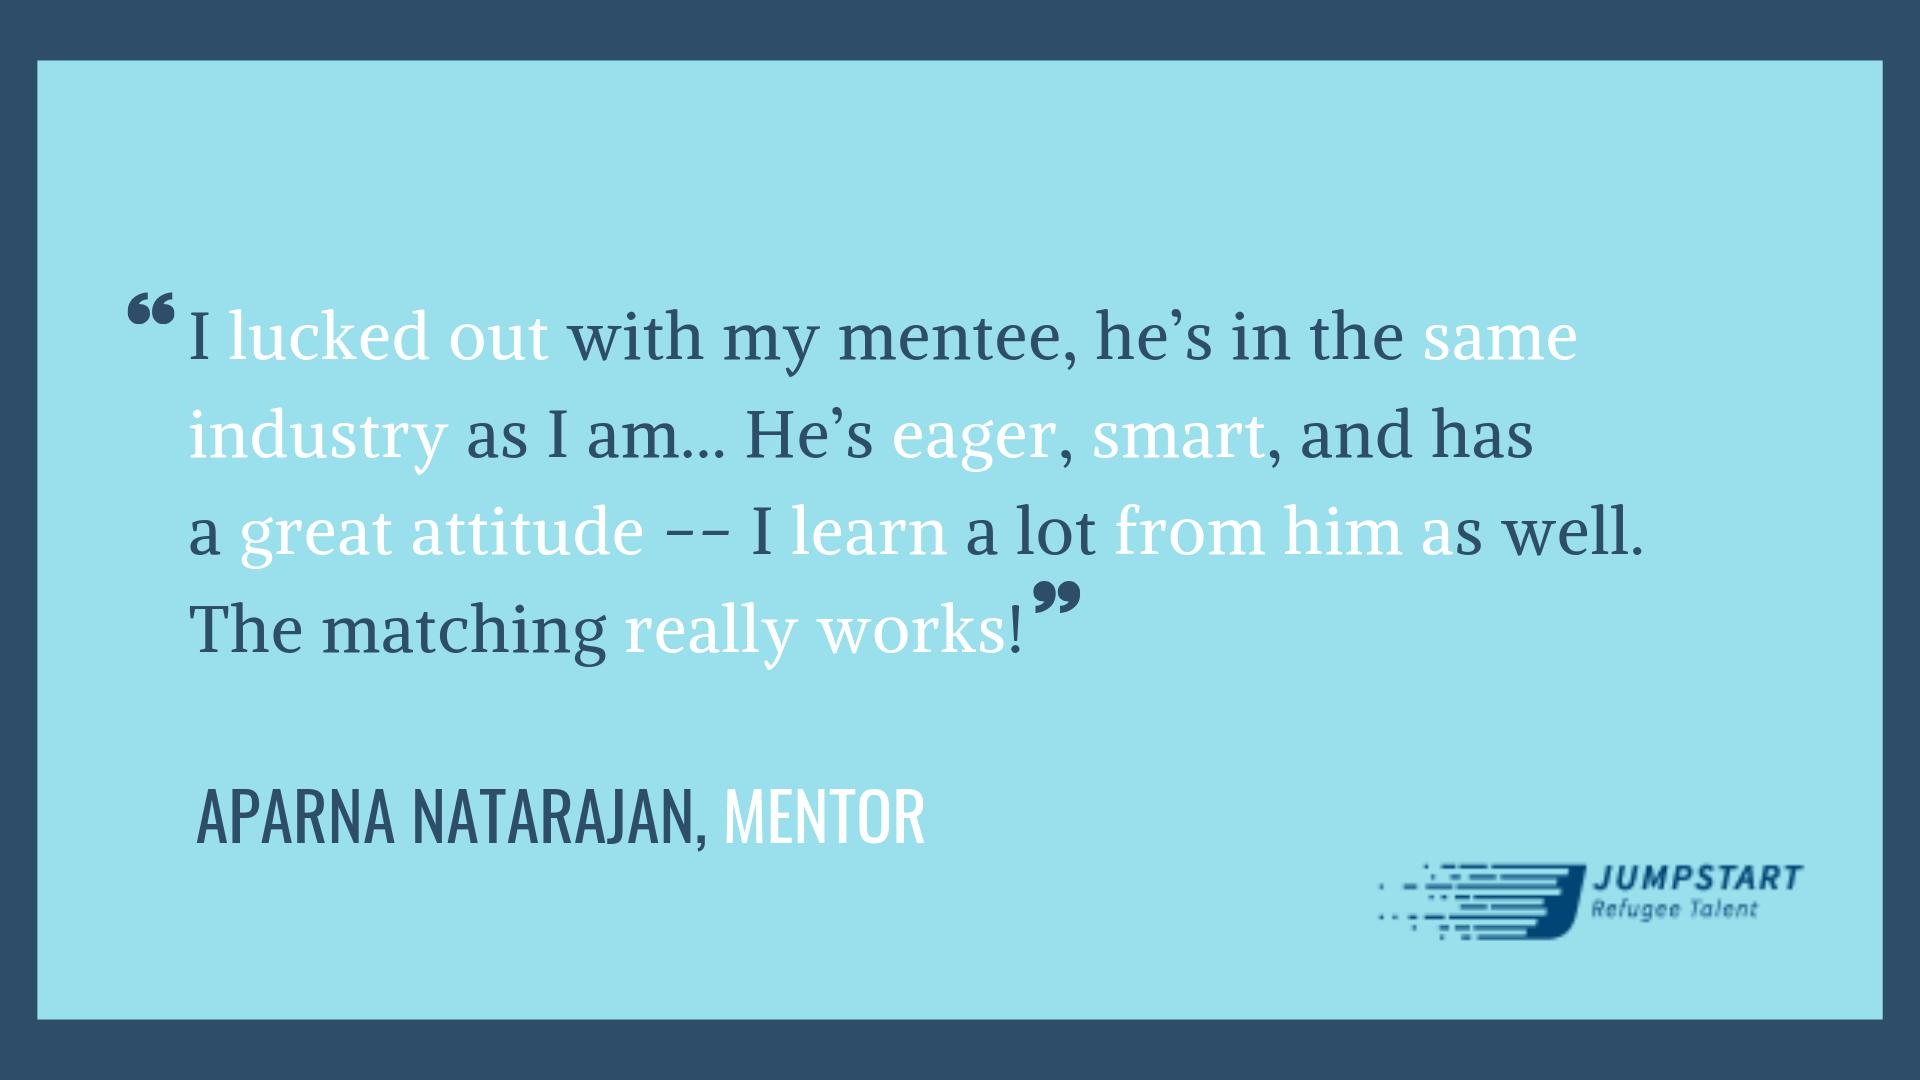 aug 1 - mentor linkedin.png